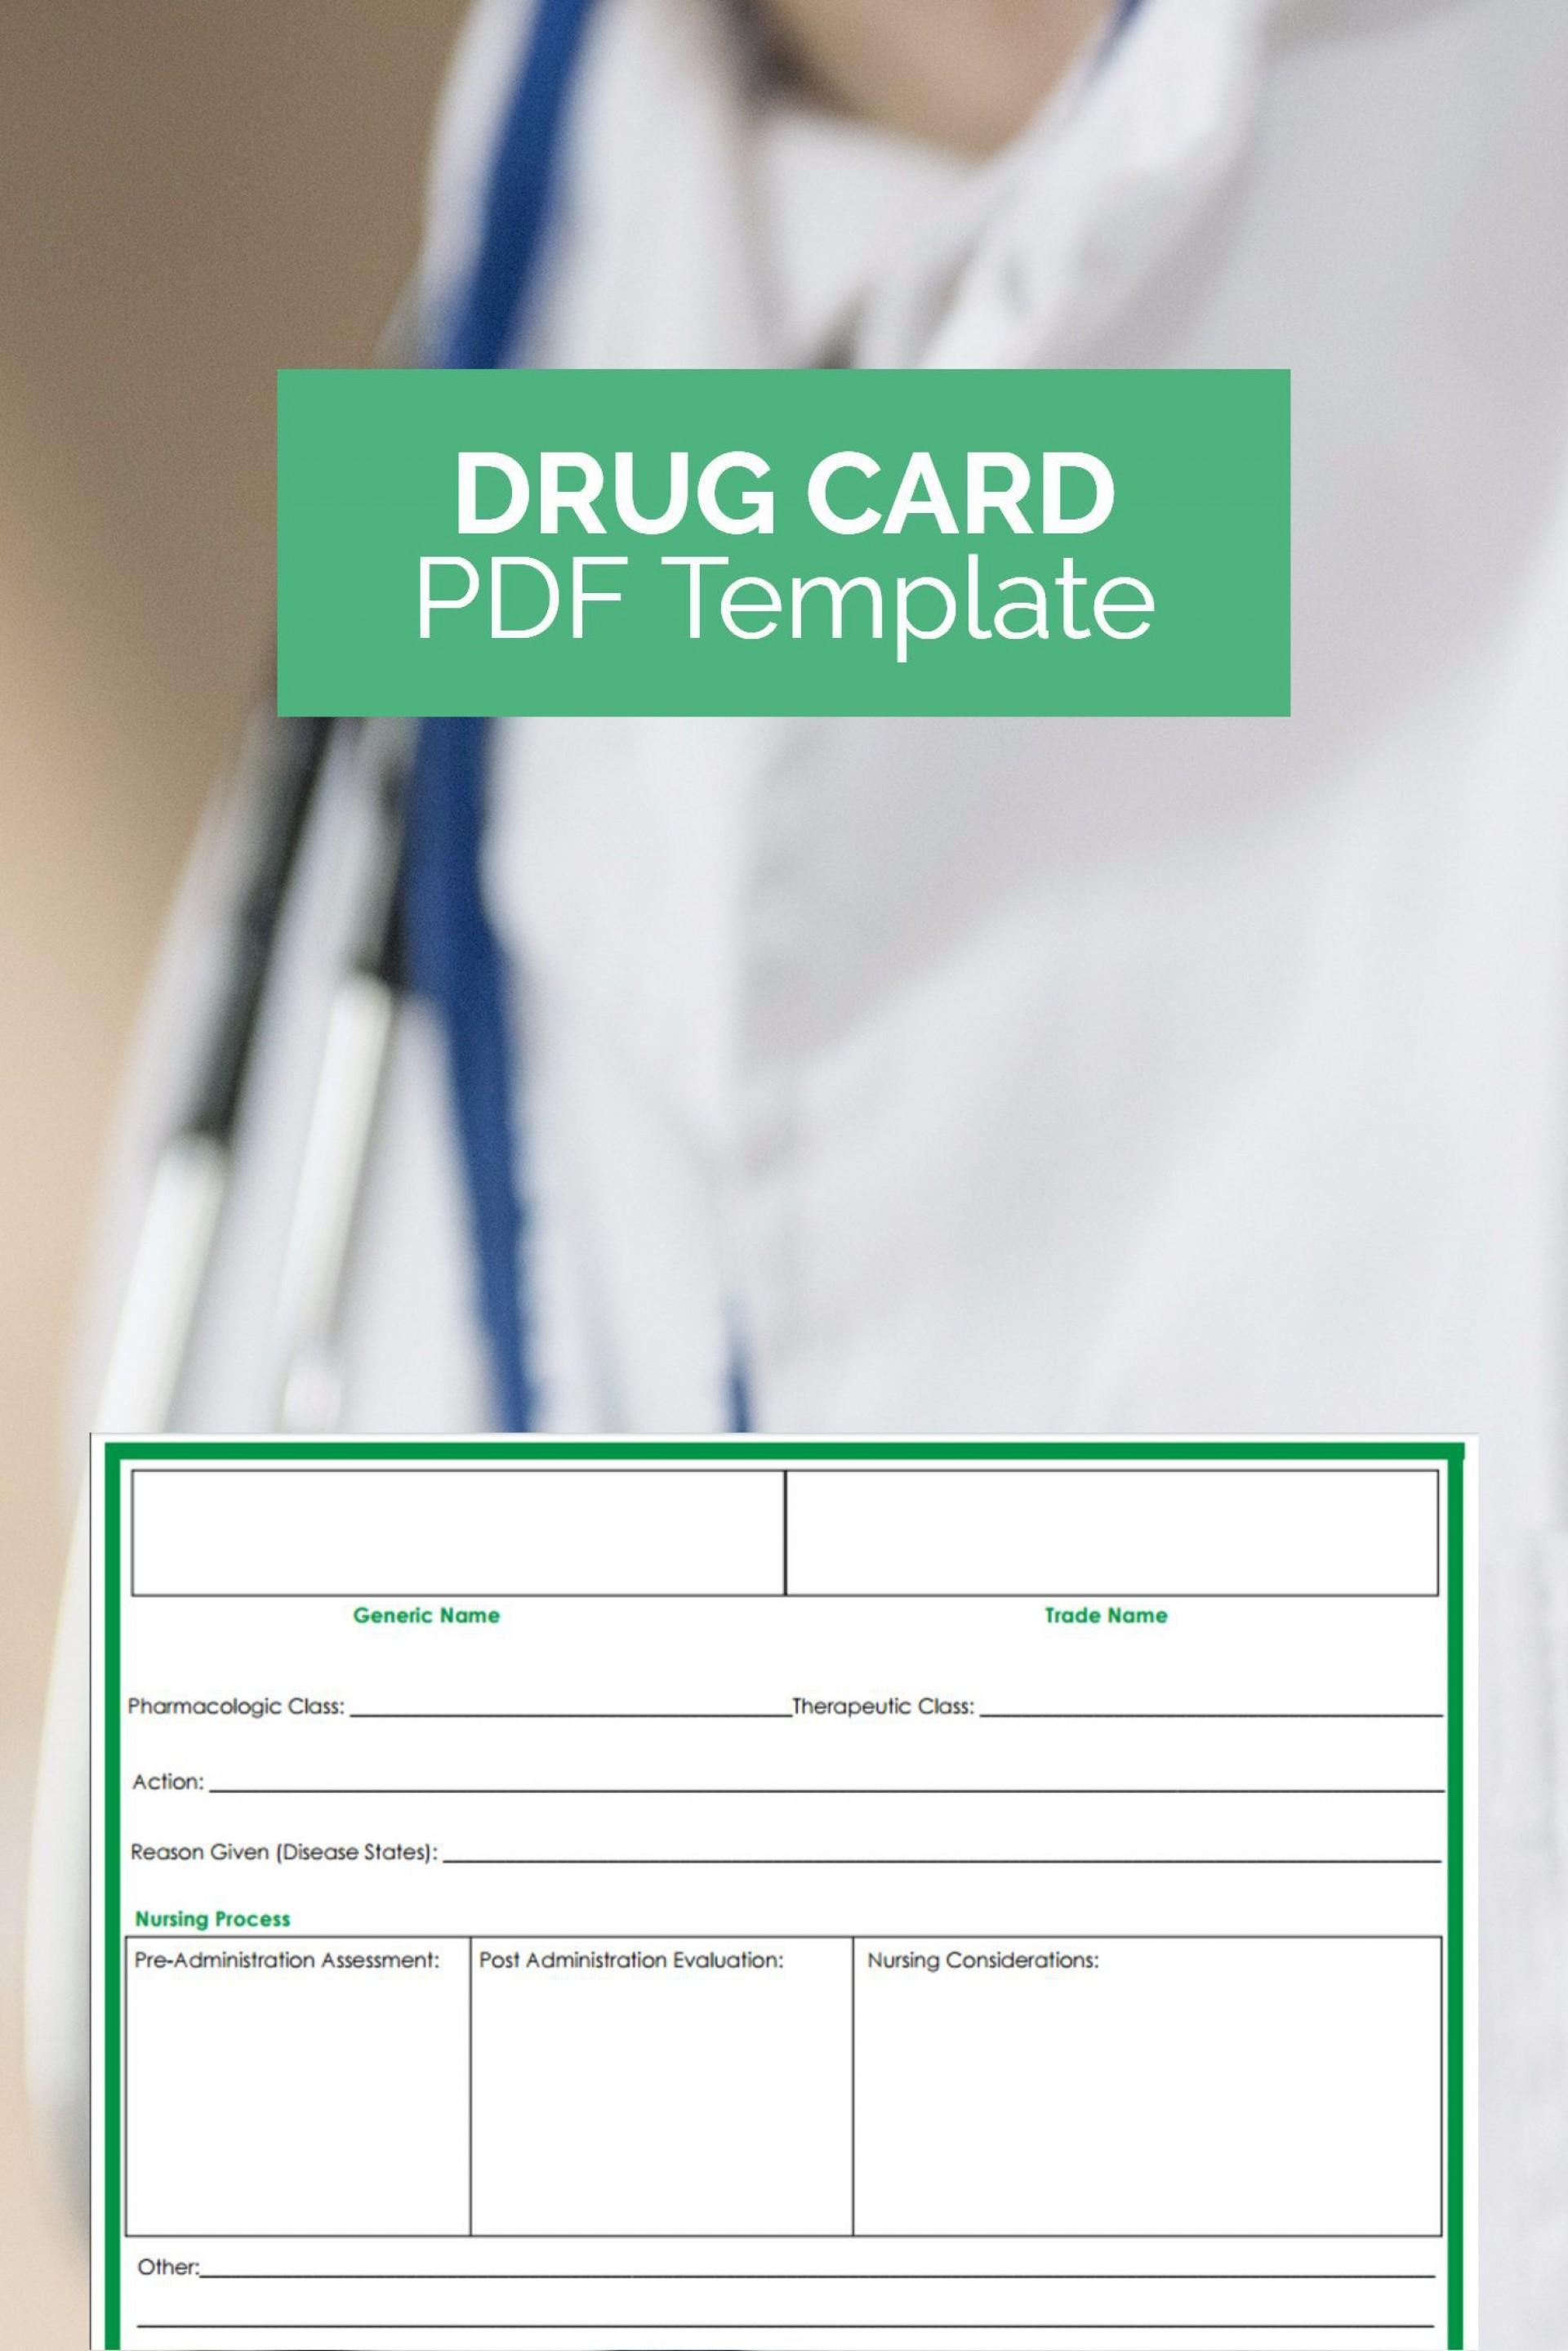 000 Unusual Nursing Drug Card Template Design  School Download Printable1920